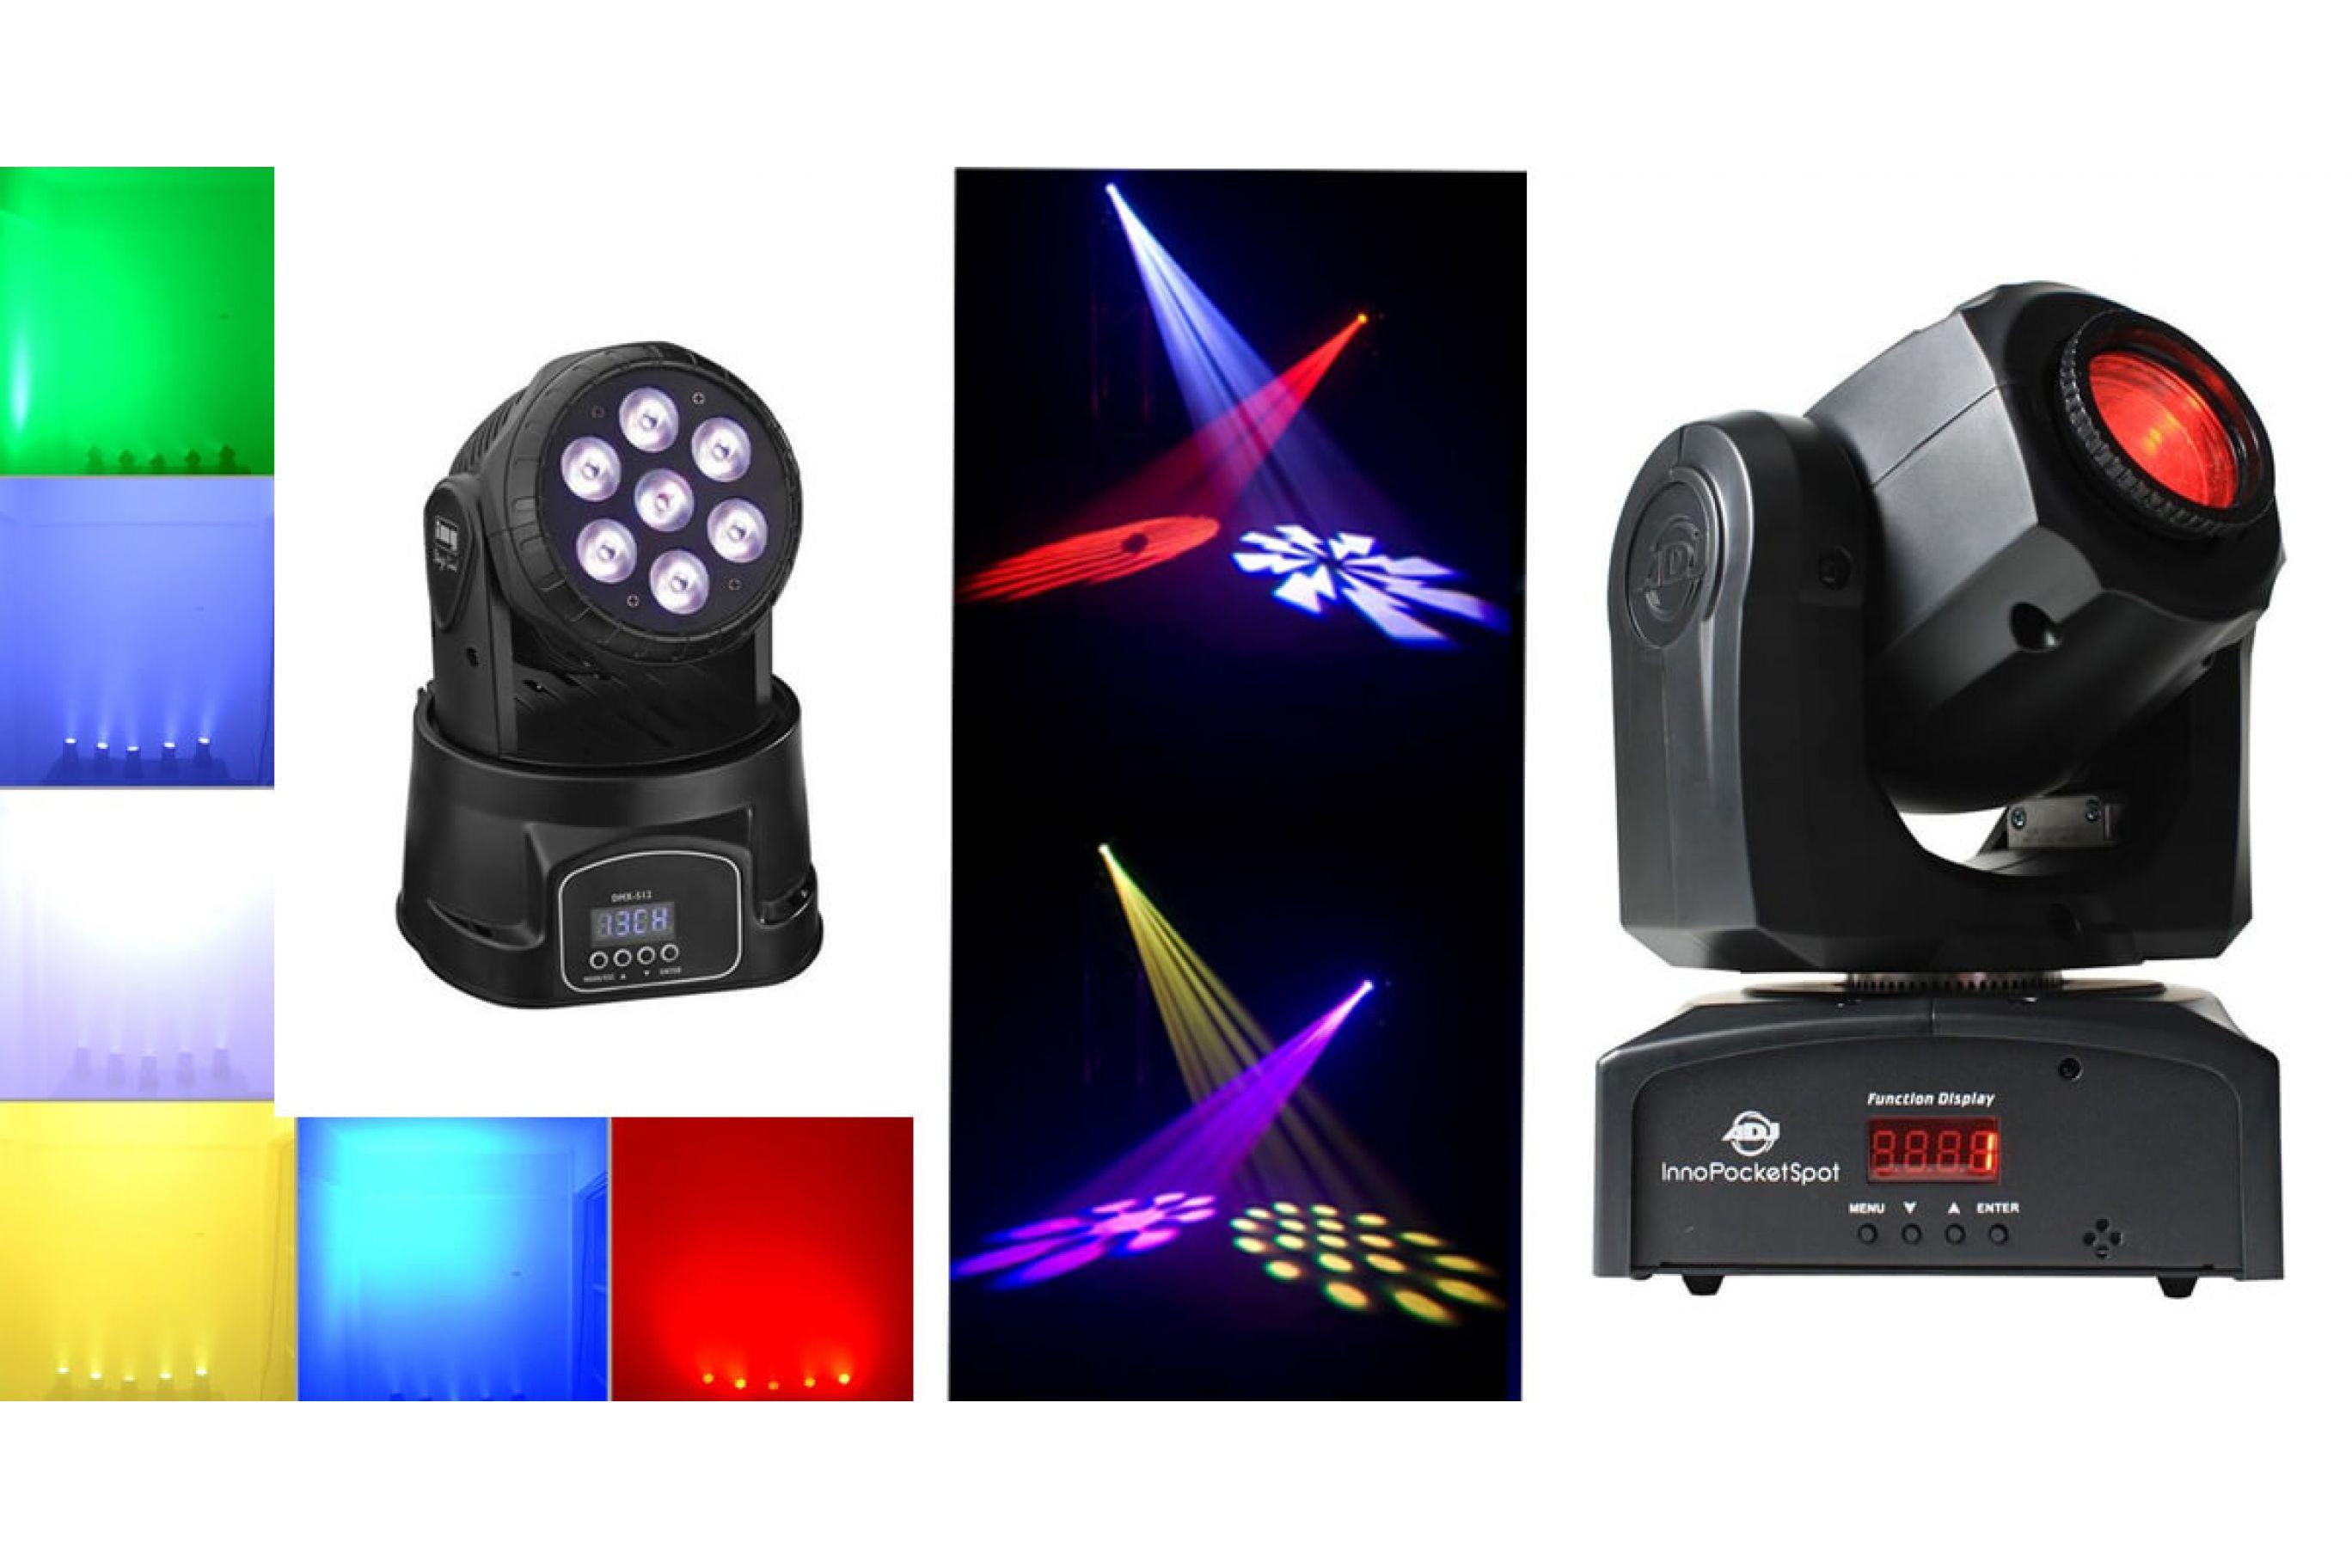 Illuminazione led & luci da discoteca; teste mobili: le migliori a